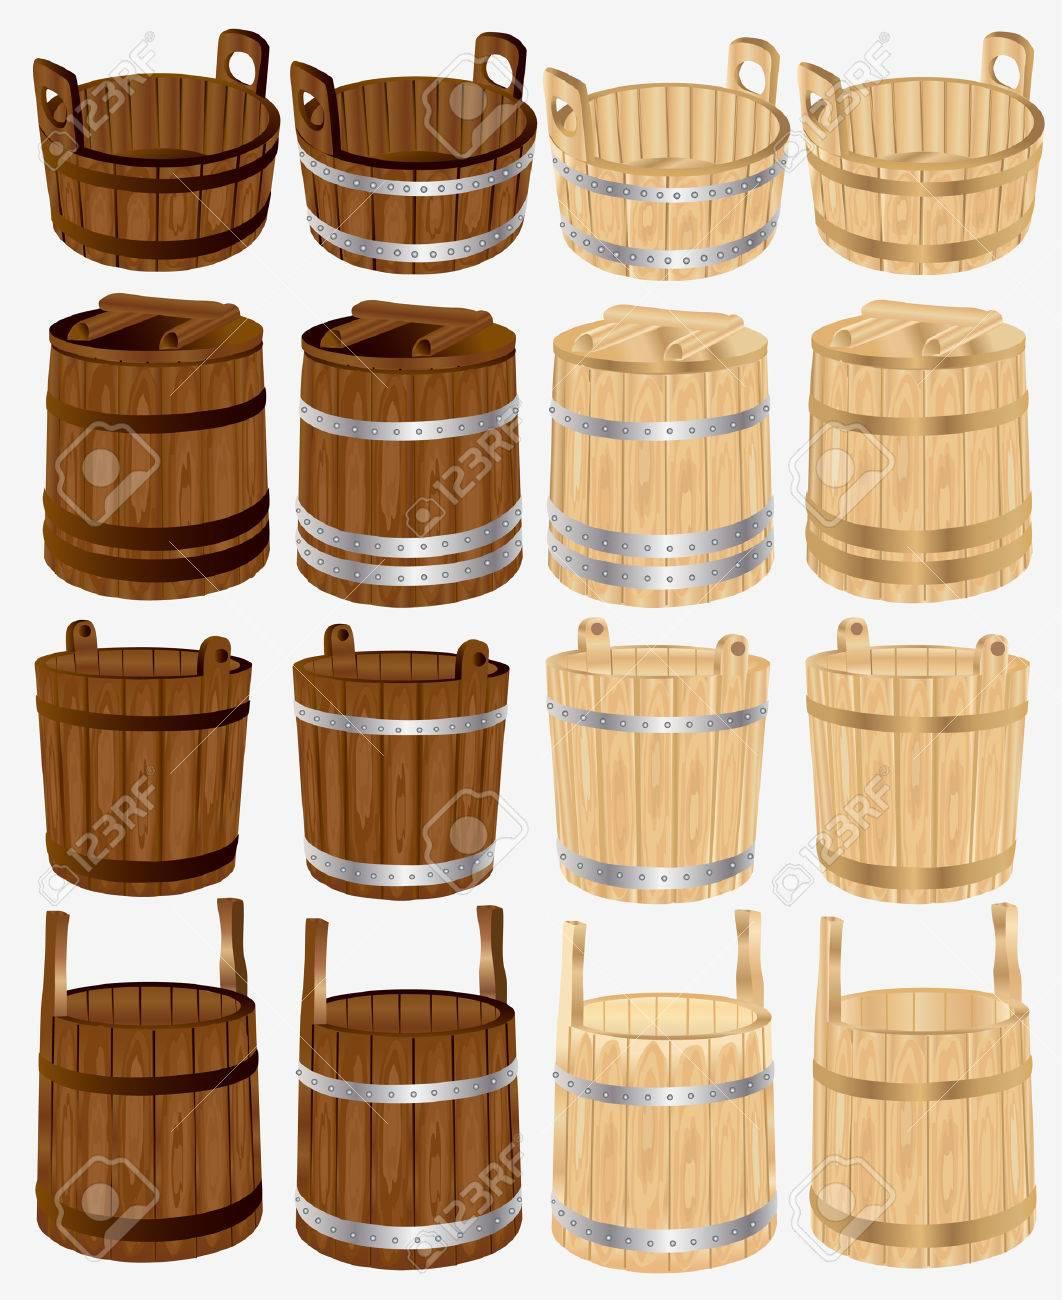 barrel bucket pail tub wood Stock Vector - 8142484